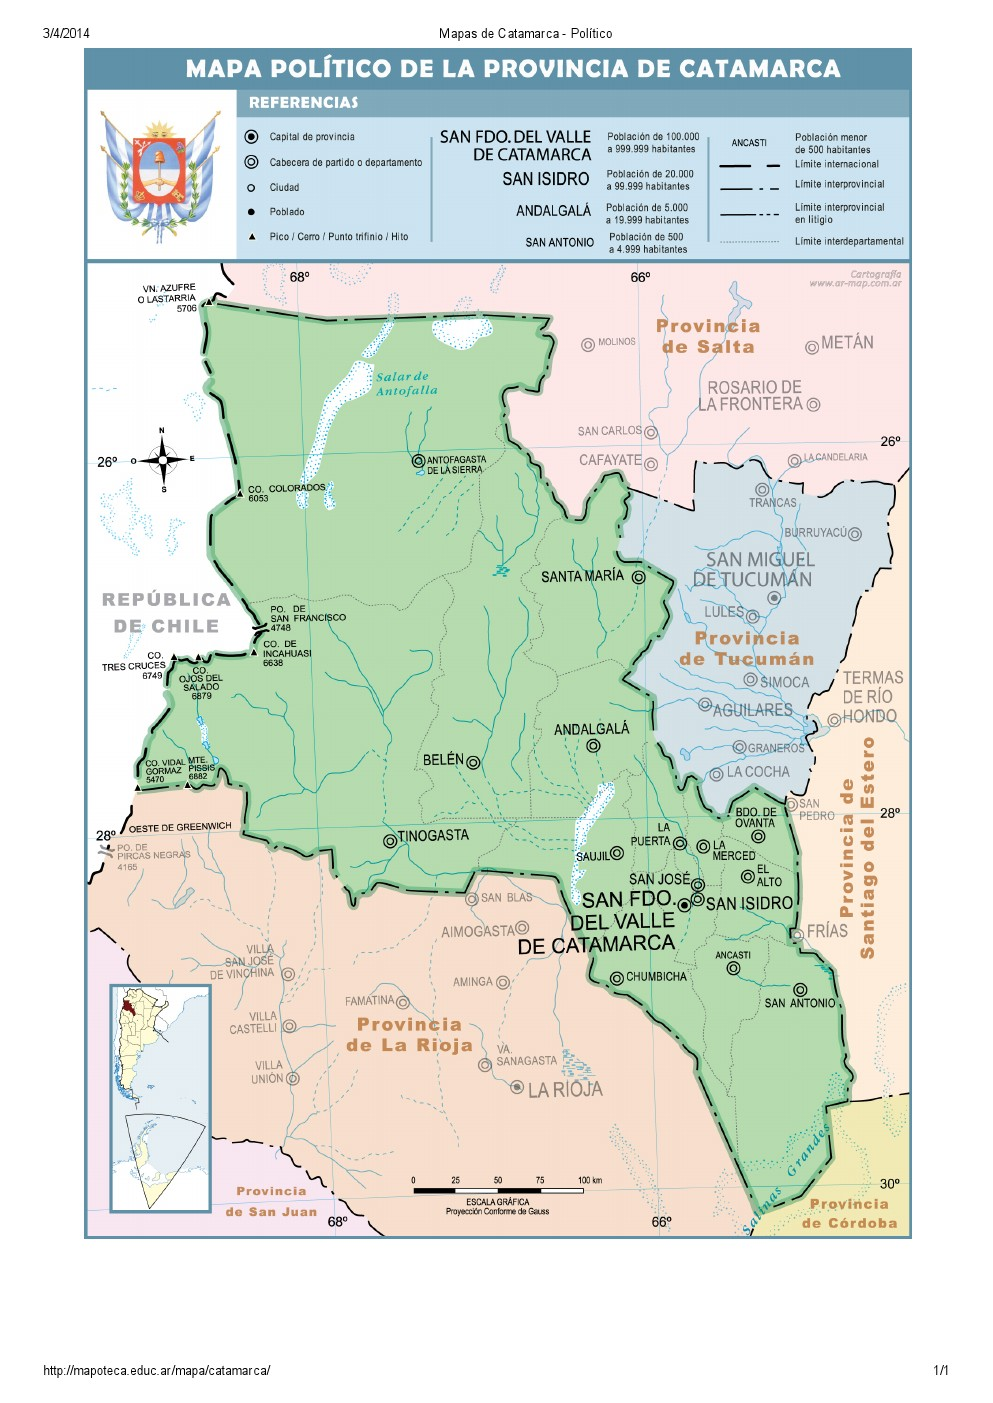 Mapa de capitales de Catamarca. Mapoteca de Educ.ar